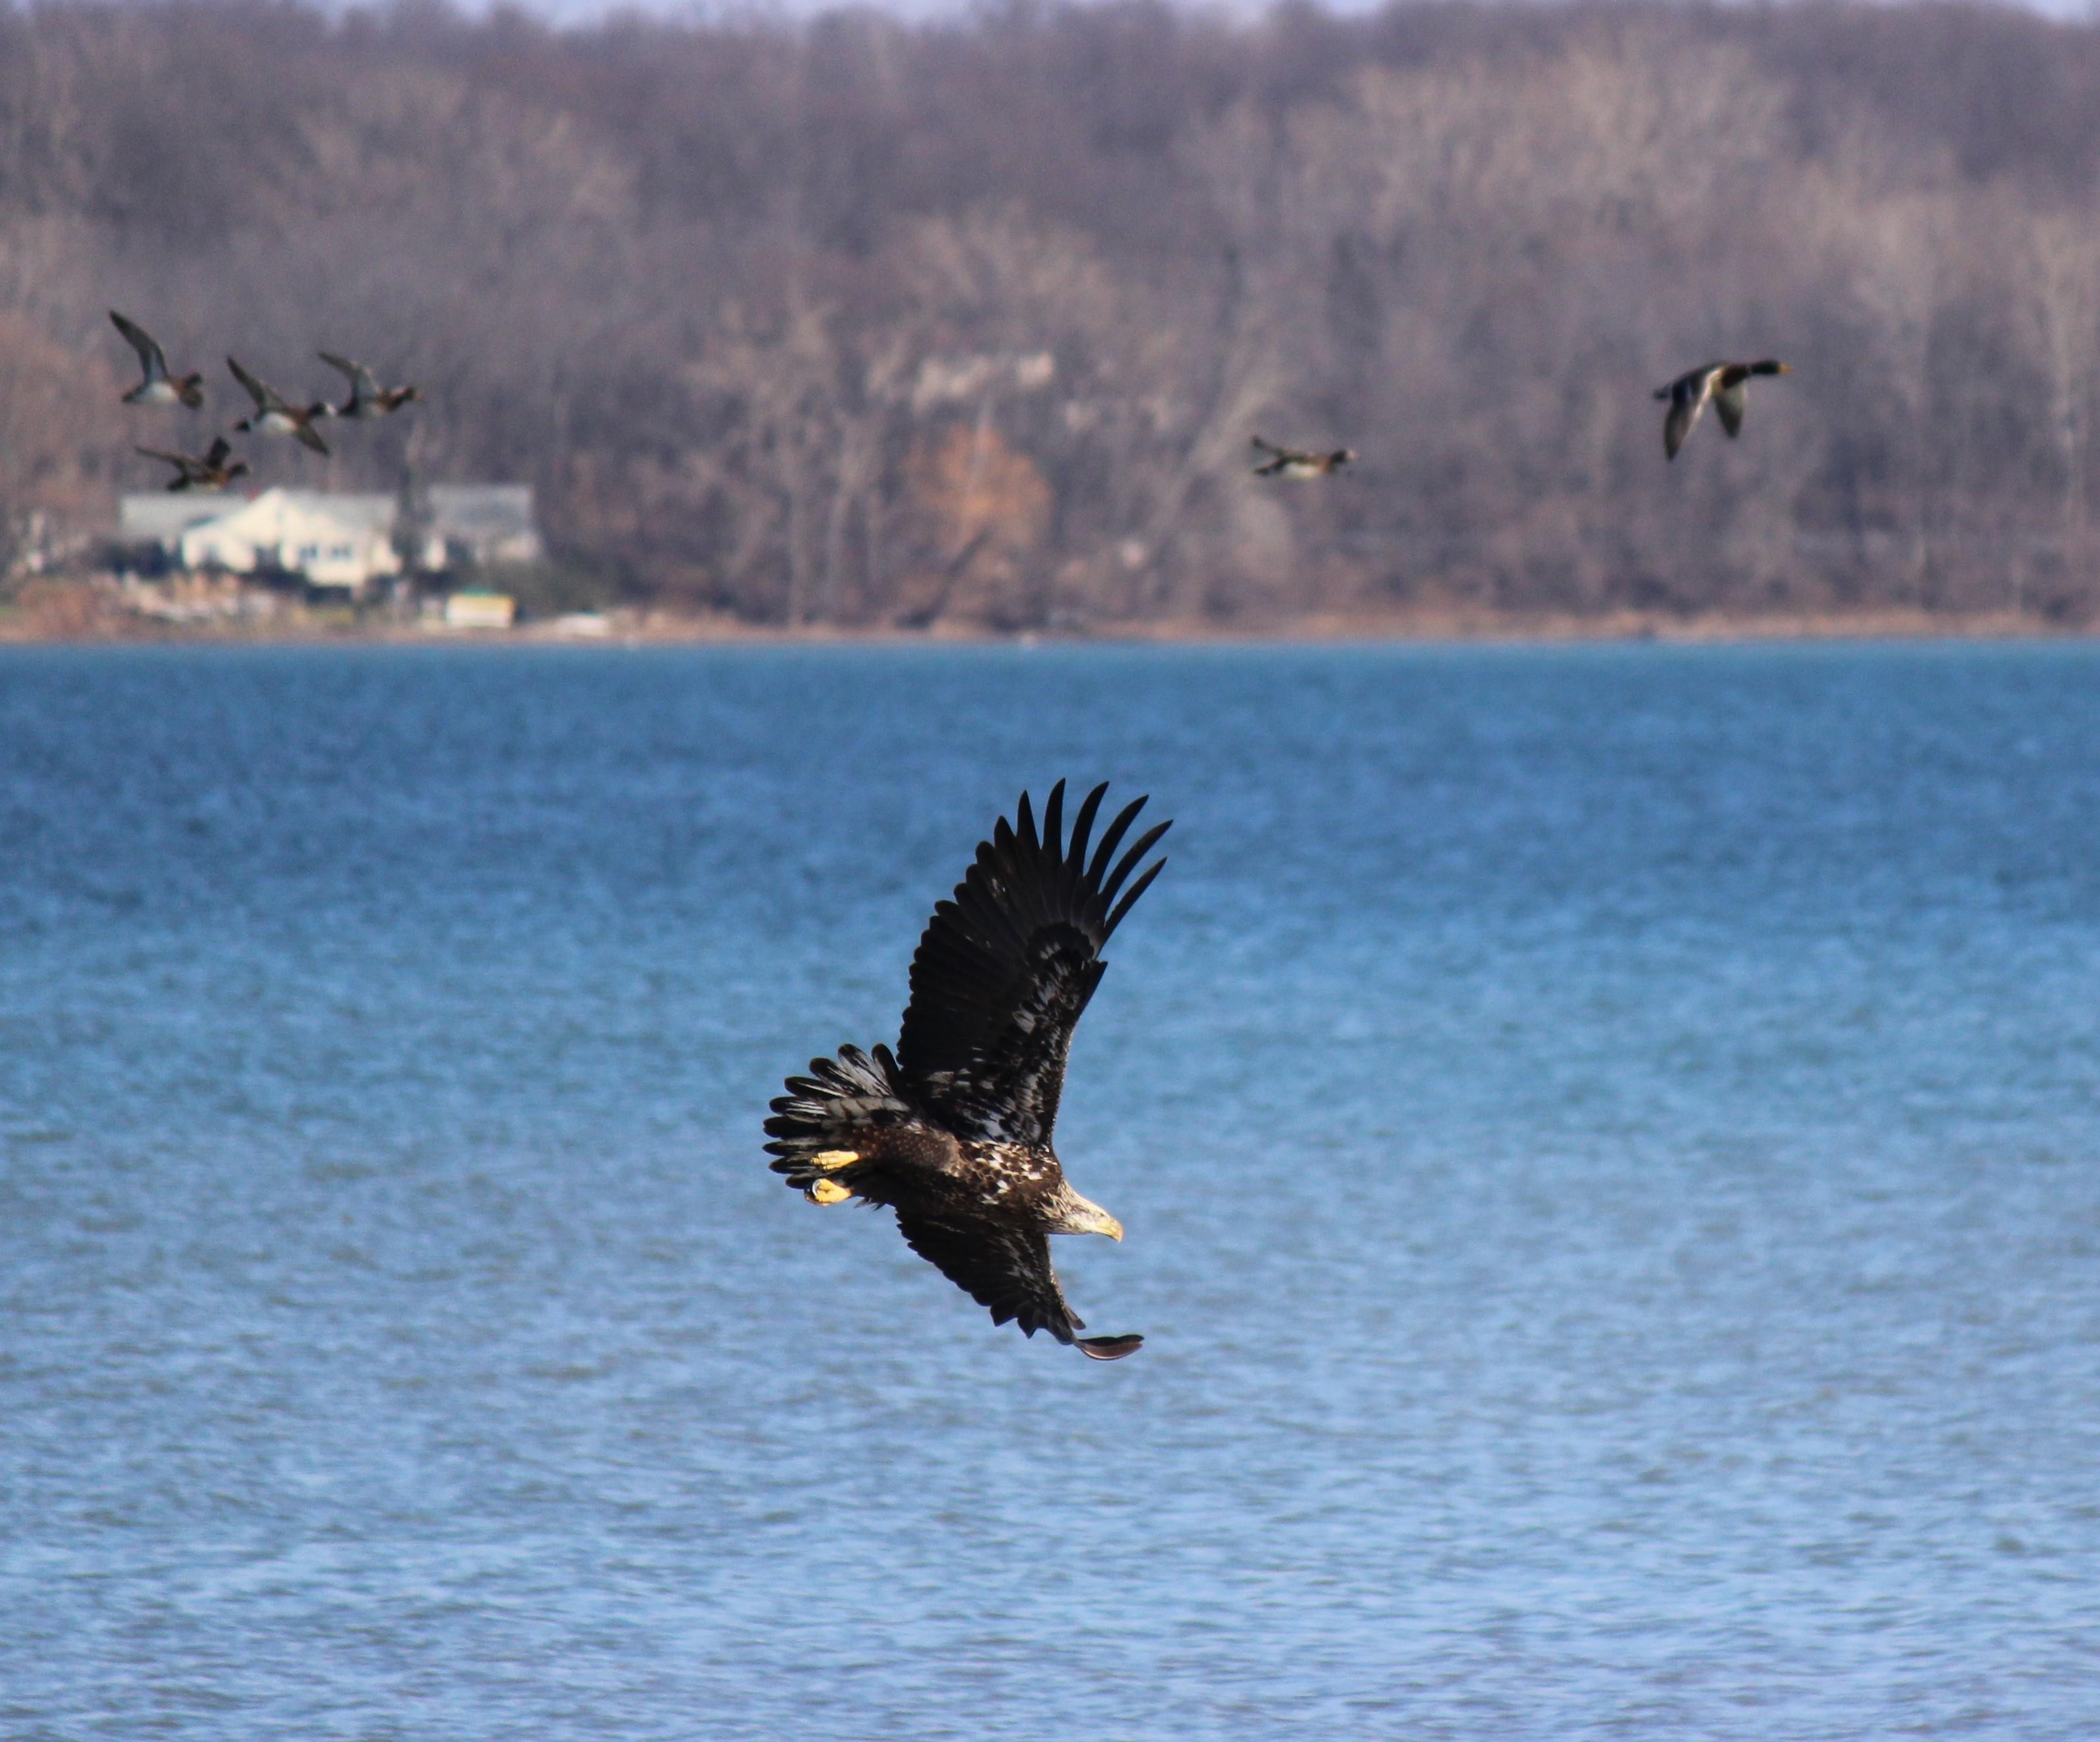 eagle and ducks.jpg